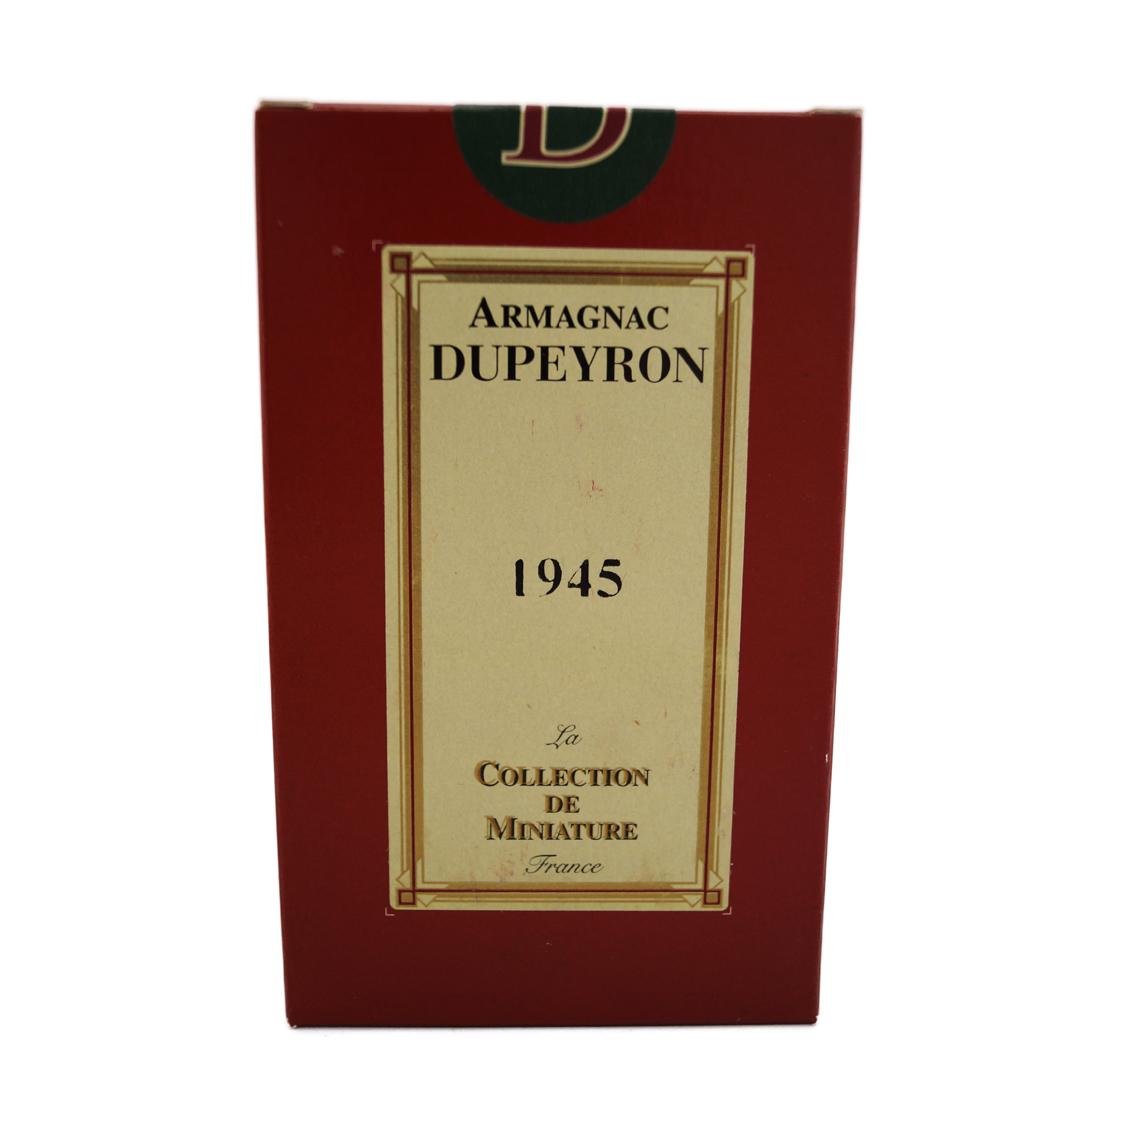 ARMAGNAC-DUPEYRON-1945-B